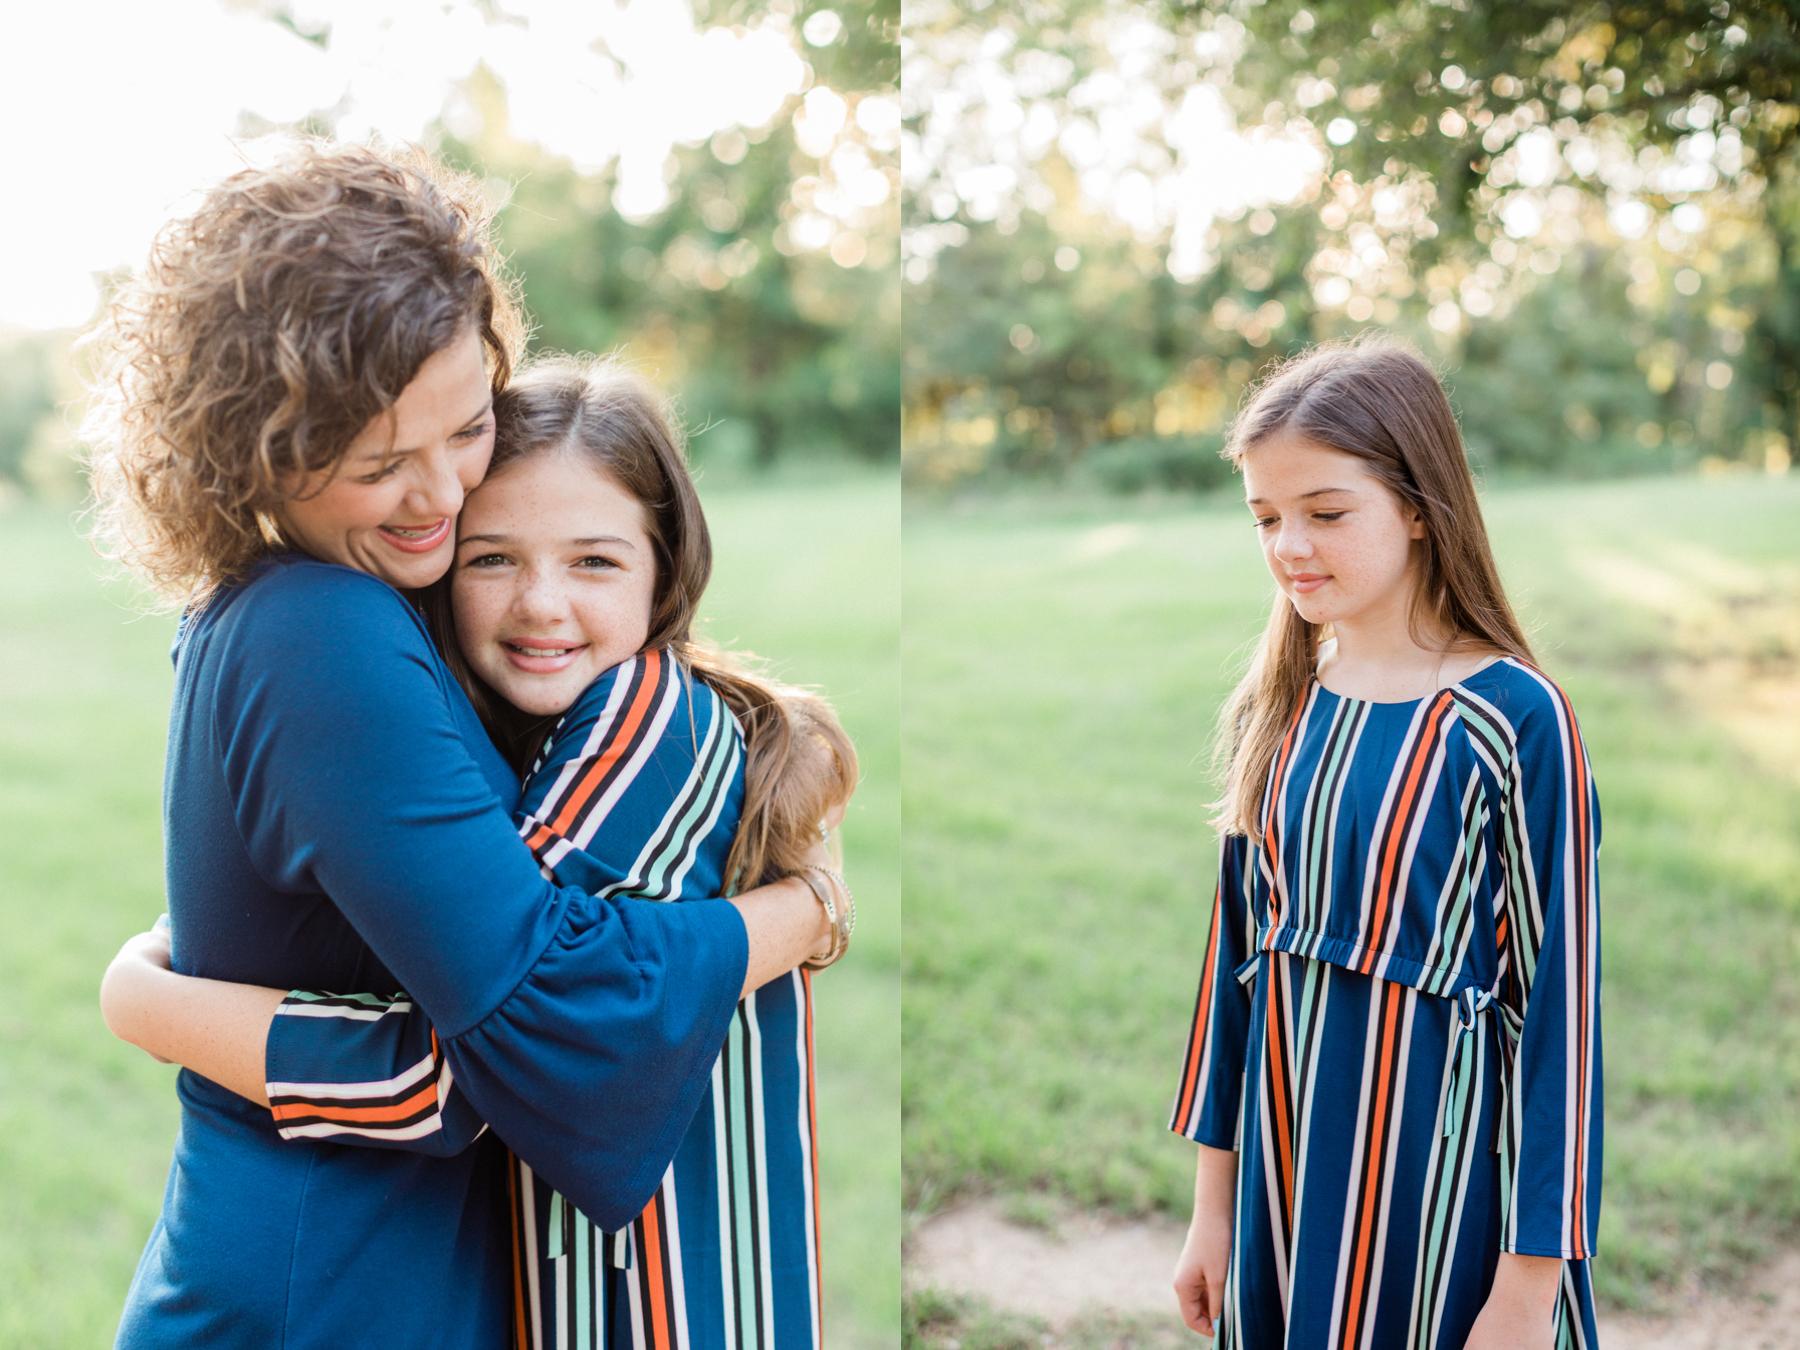 Jackson Madison MS family photographer collage 1.jpg